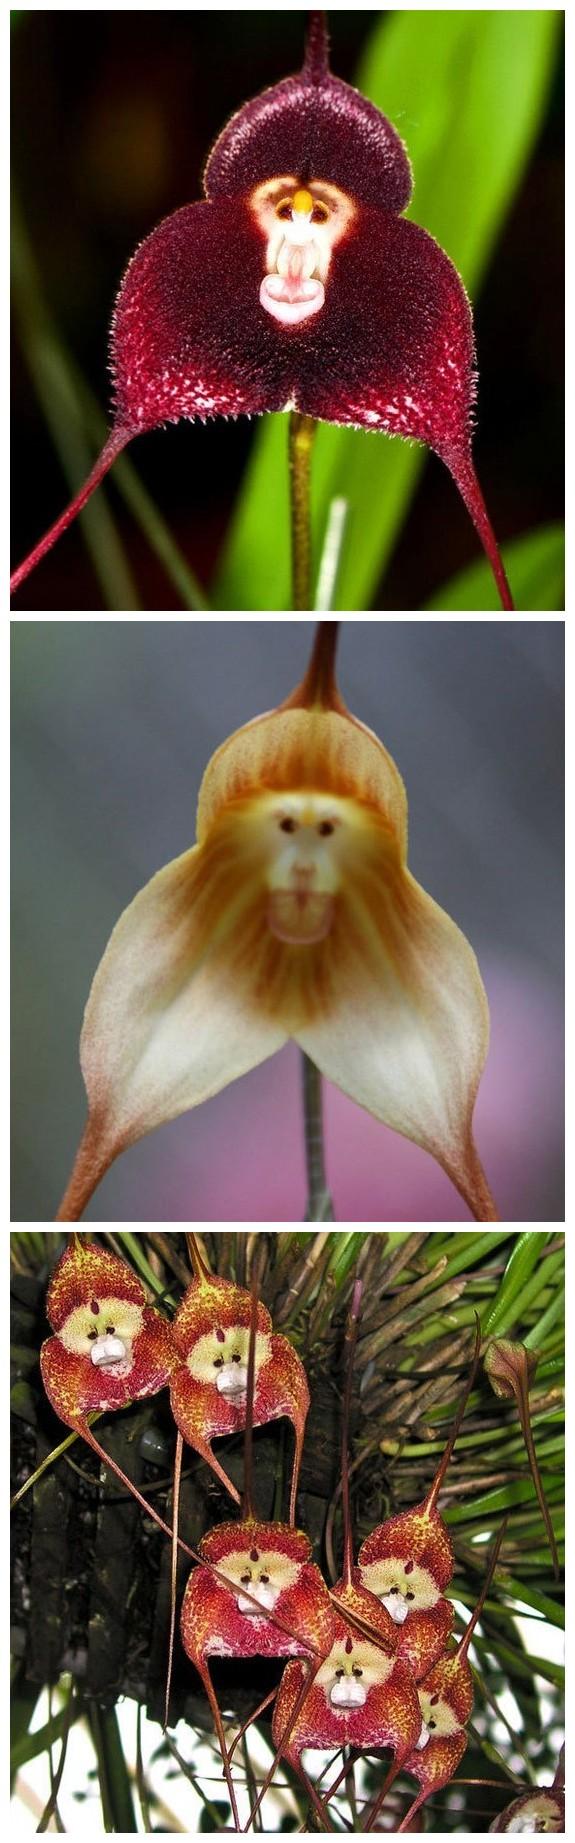 Monkey flower itus a beautiful world pinterest monkey flower